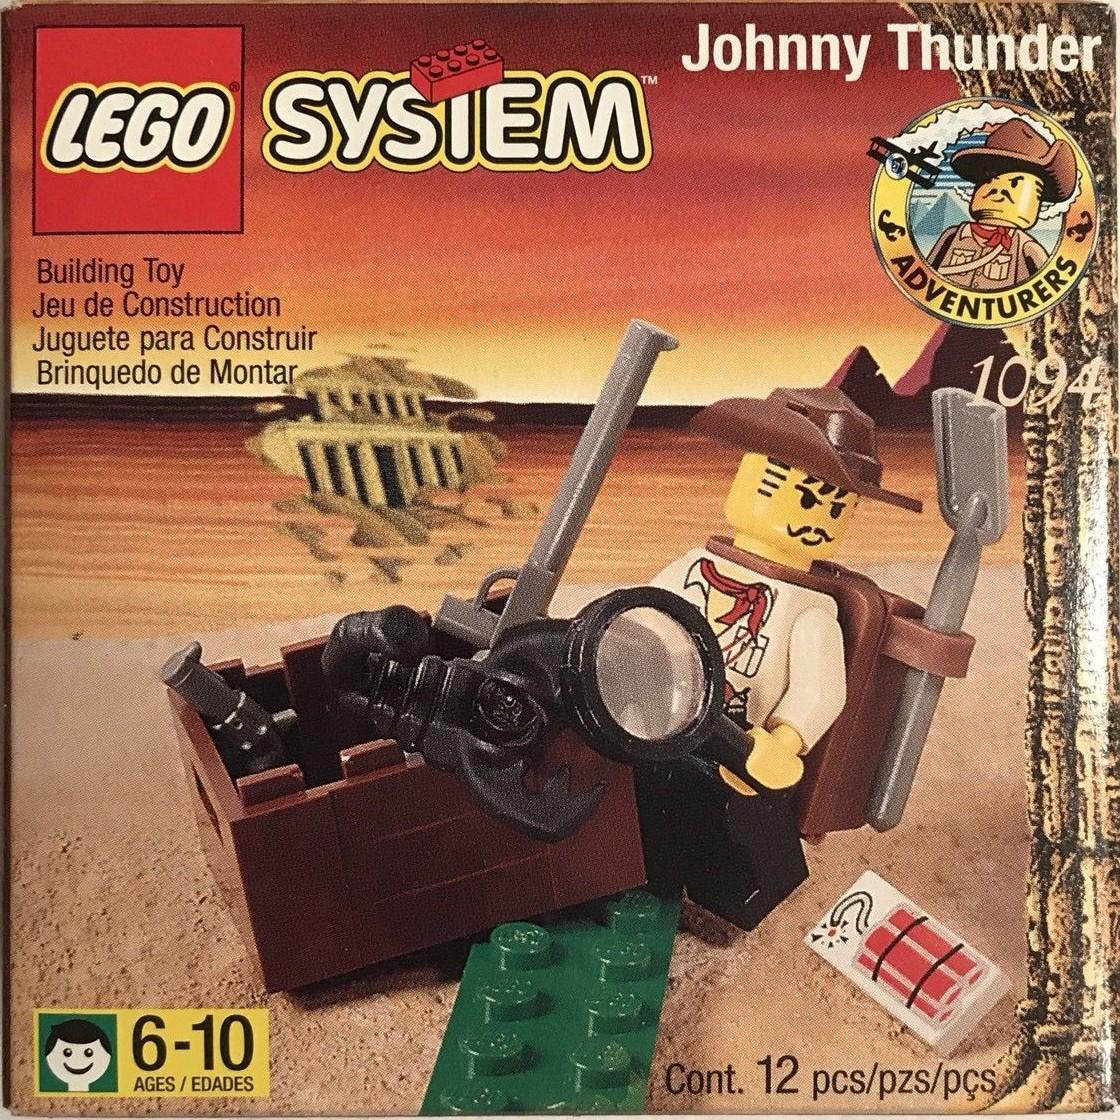 Lego Vintage Pharaoh Hotep Minifigure Adventure Desert Minifig Sarcophagus